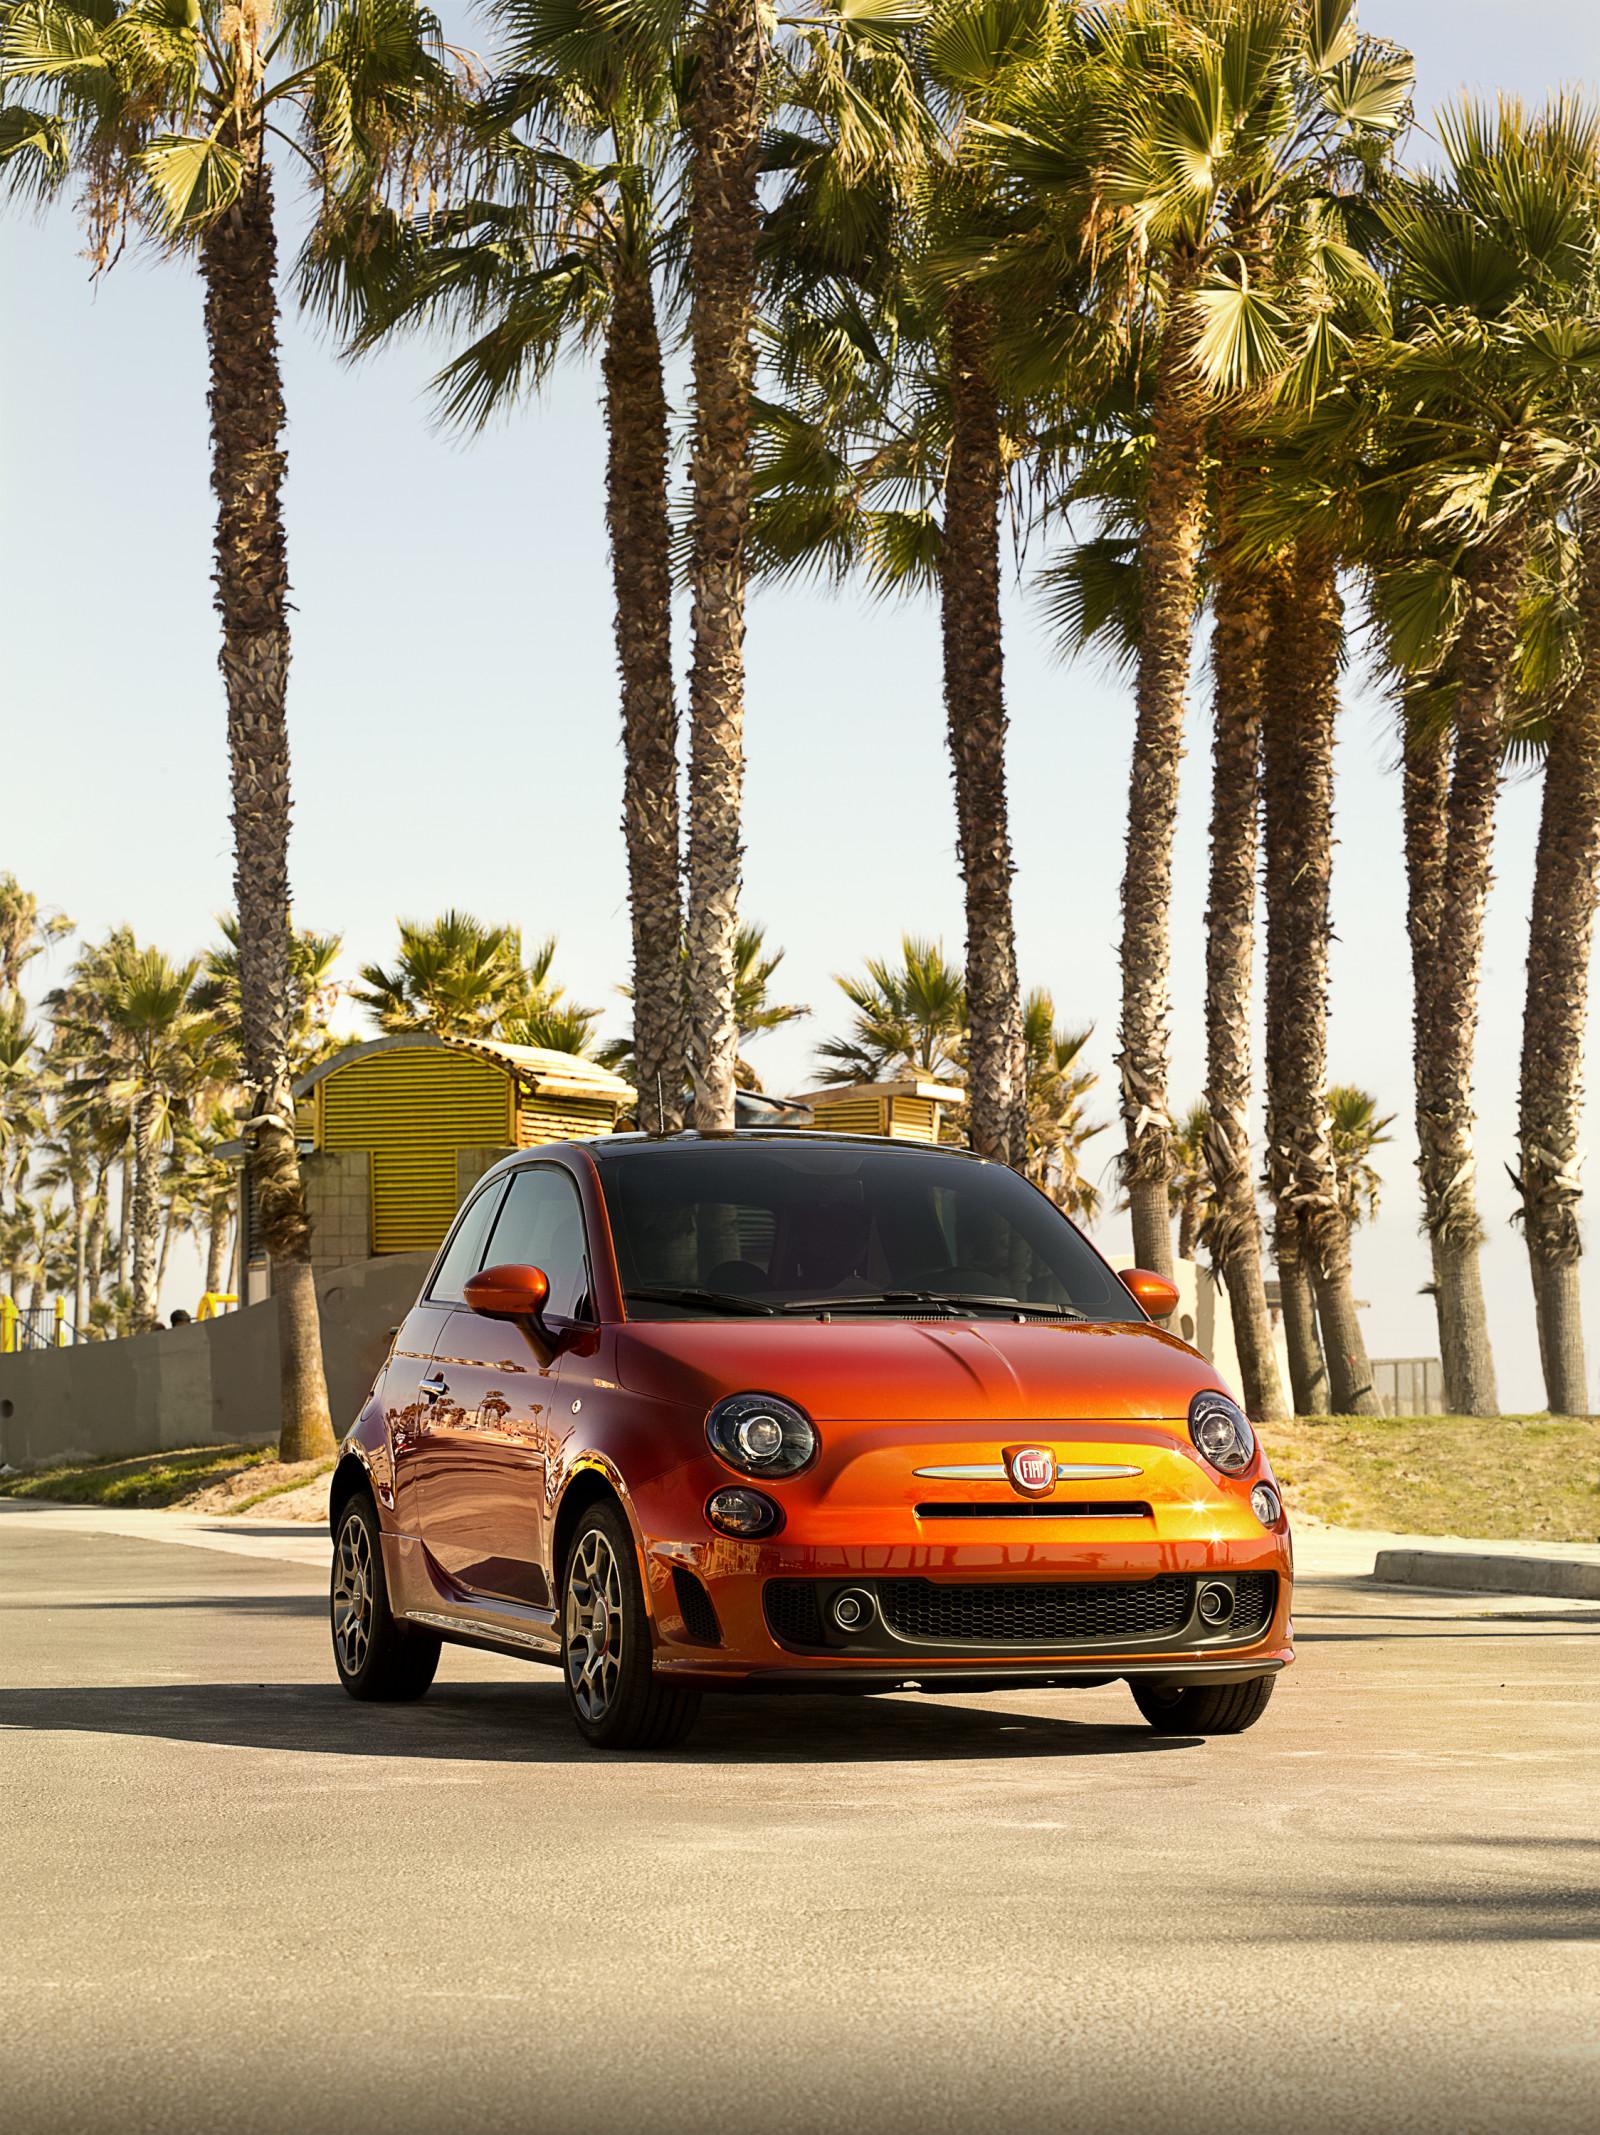 Wallpaper : Mini, FIAT, netcarshow, netcar, car images ...